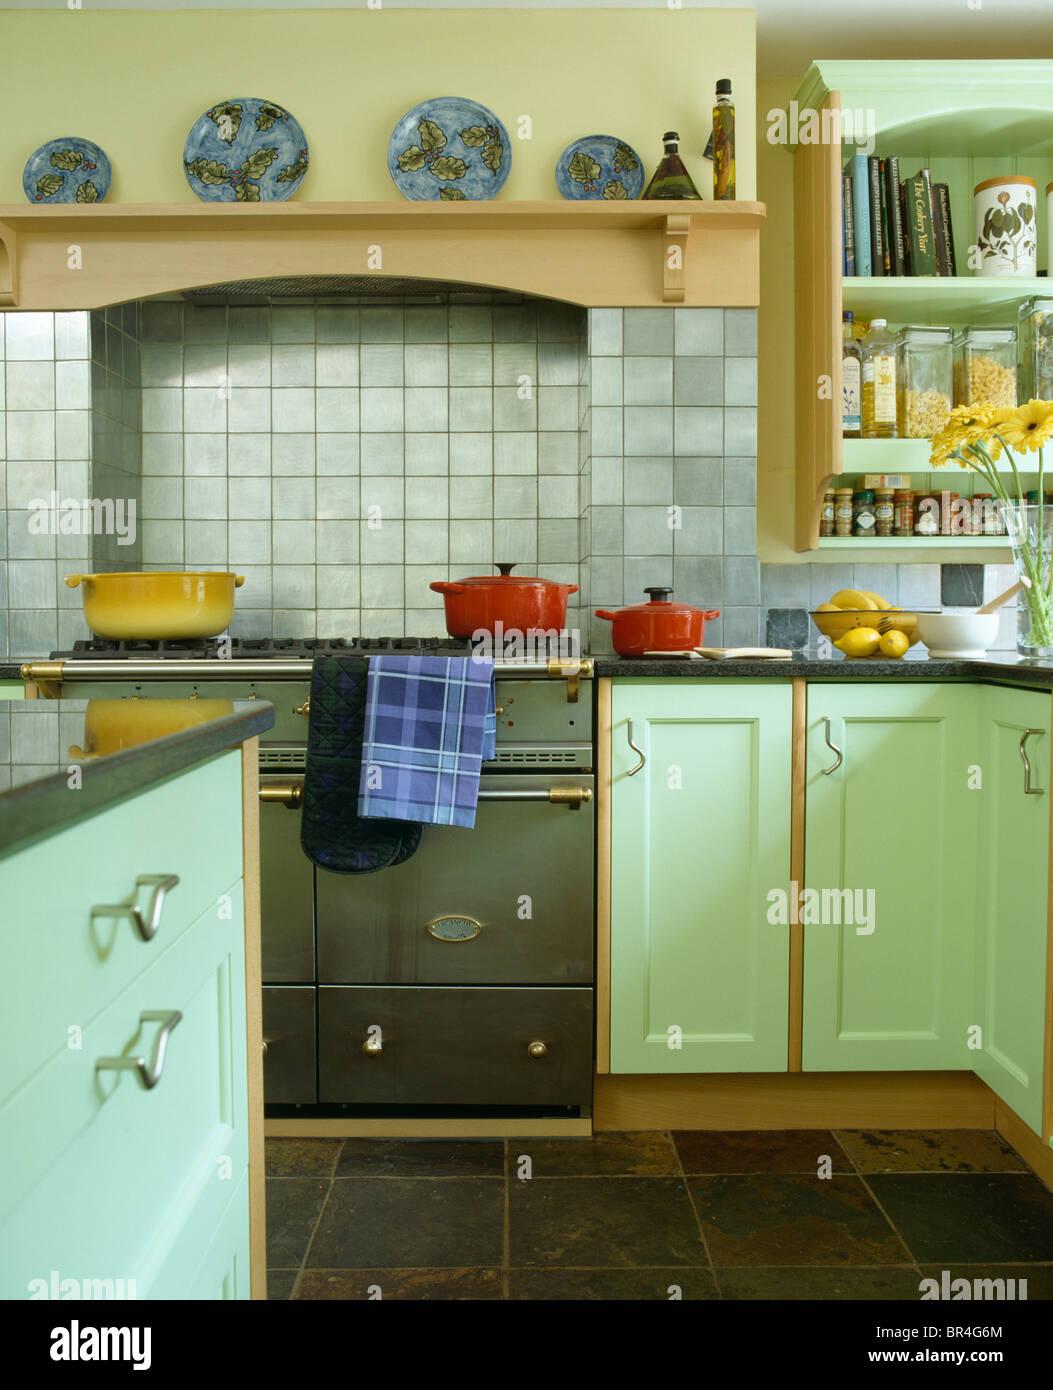 Fliesen kuche wand landhaus - Grune kuchenwand ...